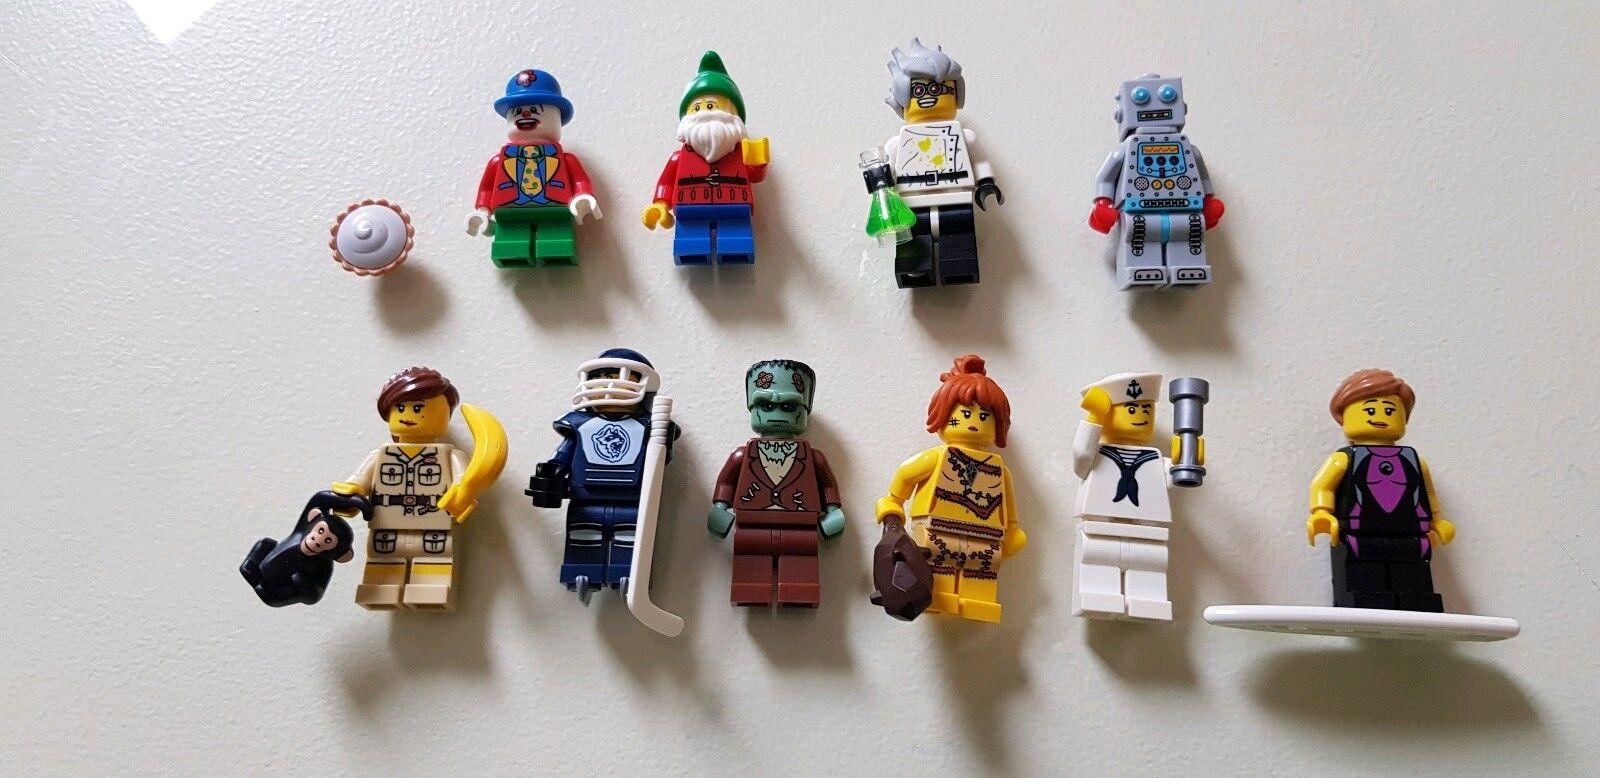 Series 5 X 10 Lego Minifigures Nydqub7034 Lego Minifigures Dolls